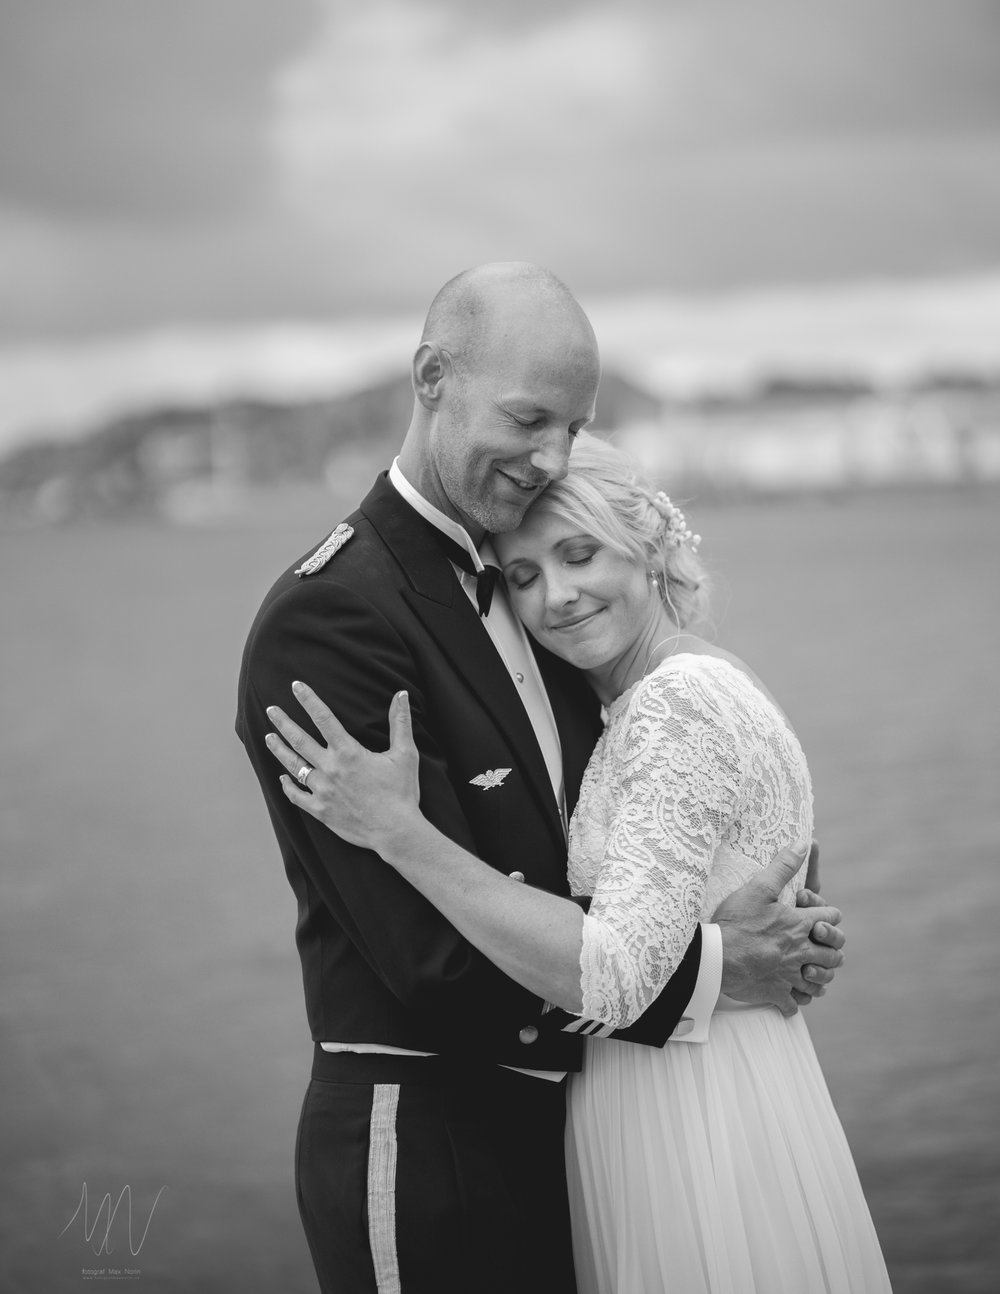 Bröllop-fotografmaxnorin.se-MariaMarcus-382.JPG